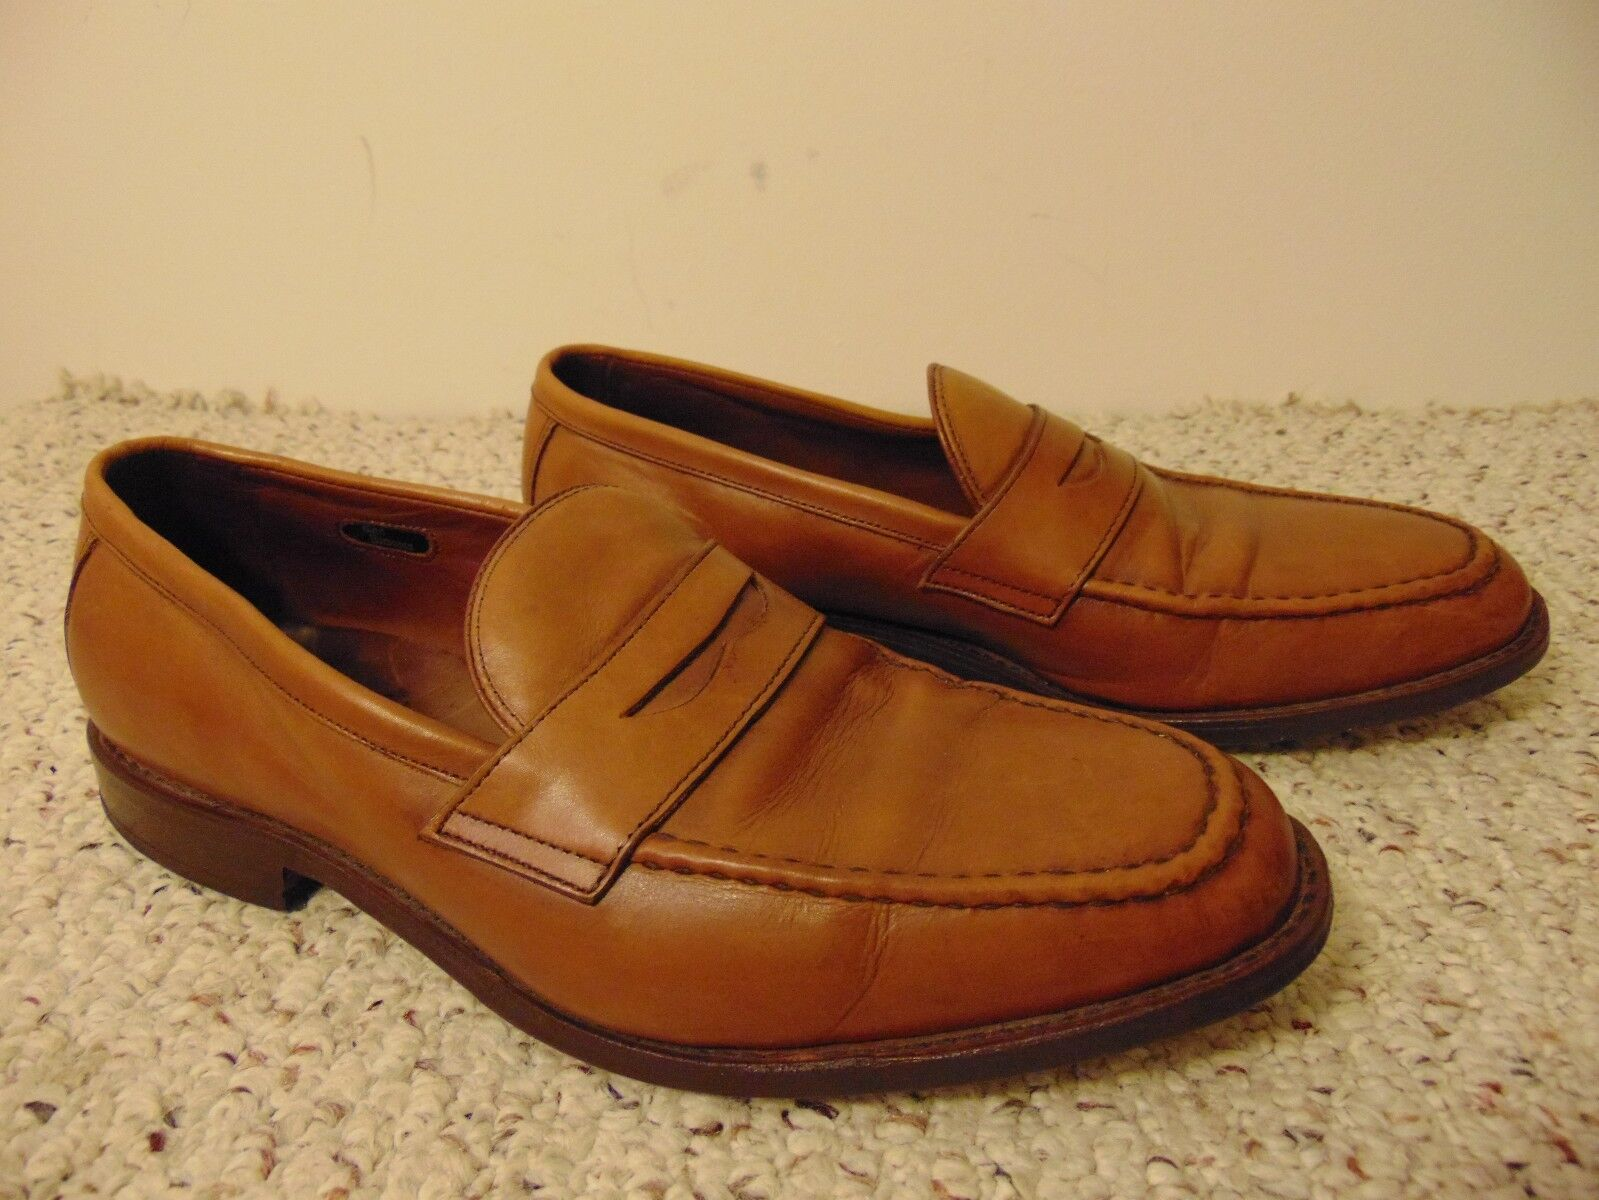 Allen Edmonds Men's McGraw' Penny Loafer tan leather shoes size 11